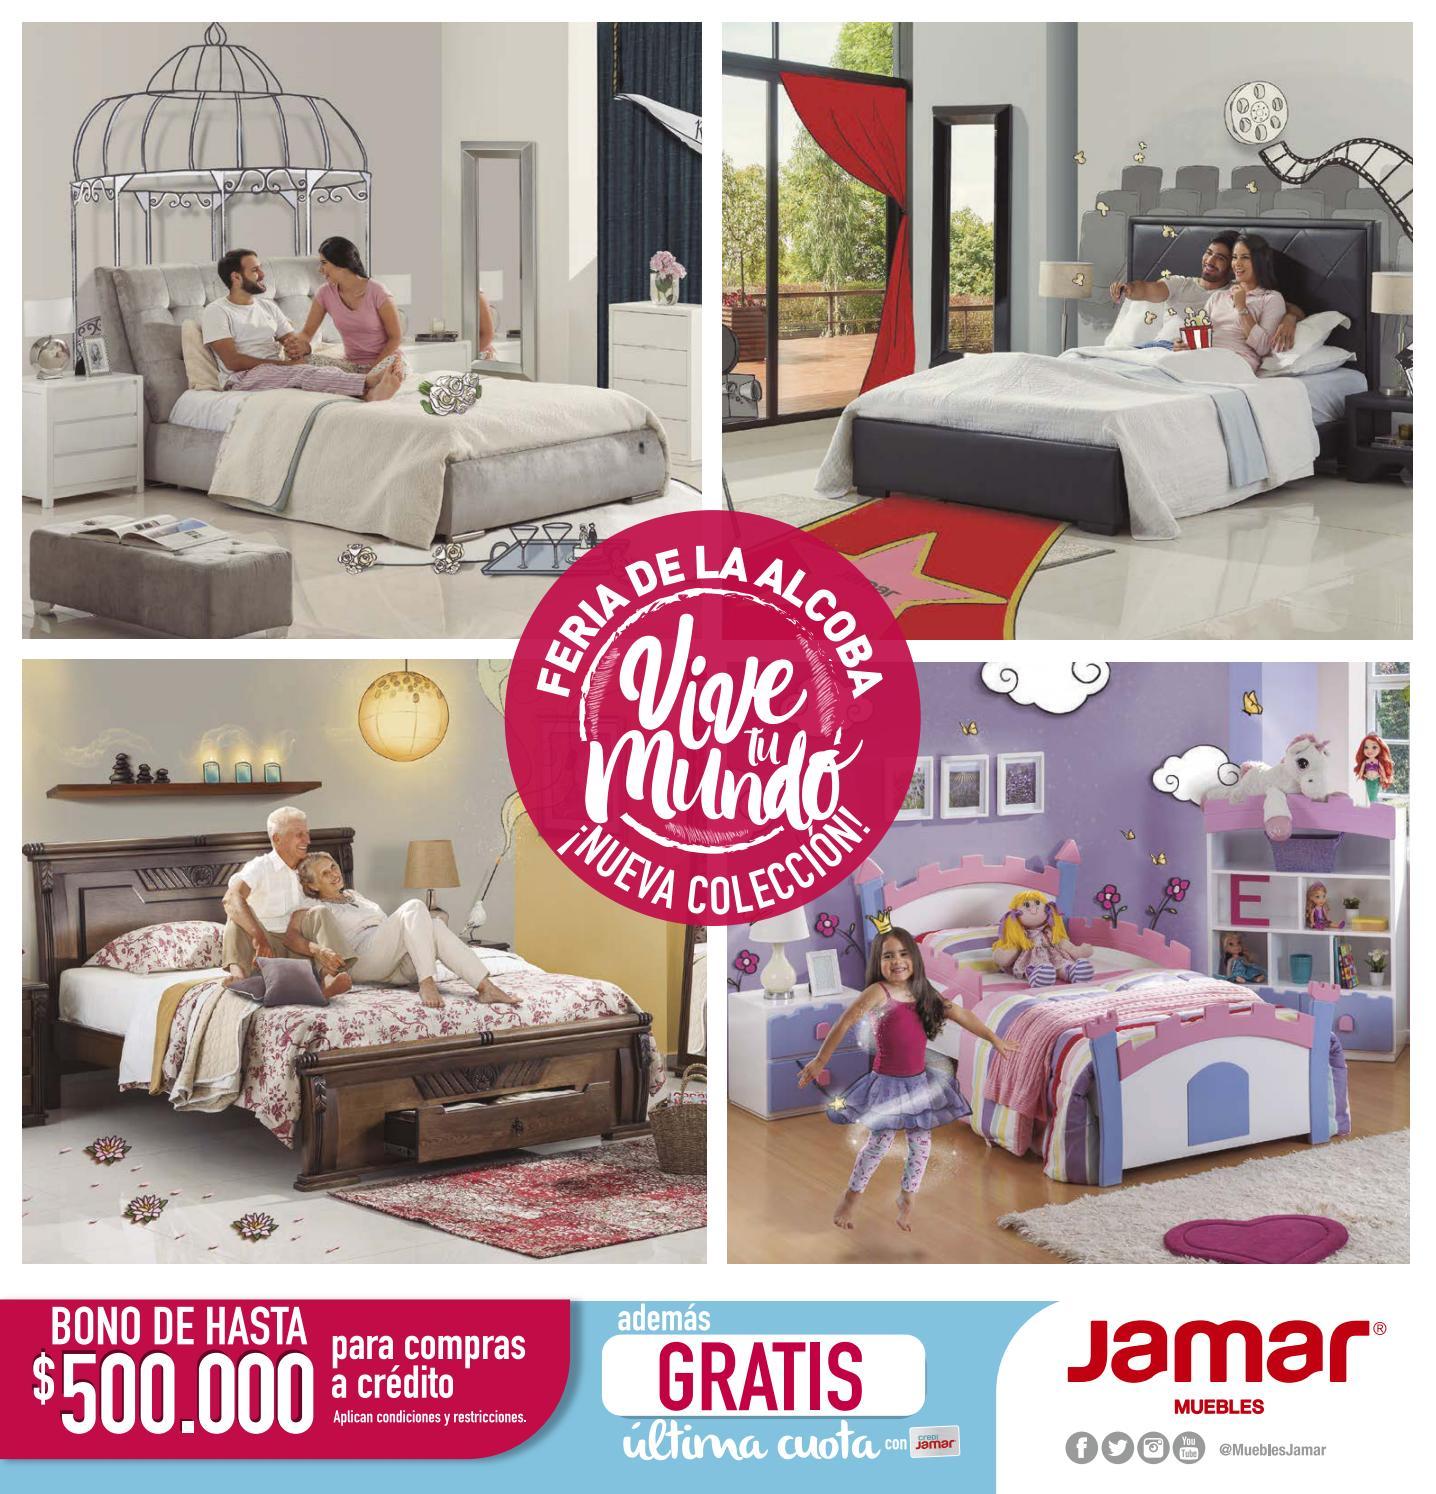 Cat Logo Outlet Jamar 2017 Medellin By Www Jamar Com Issuu # Muebles Laalcoba